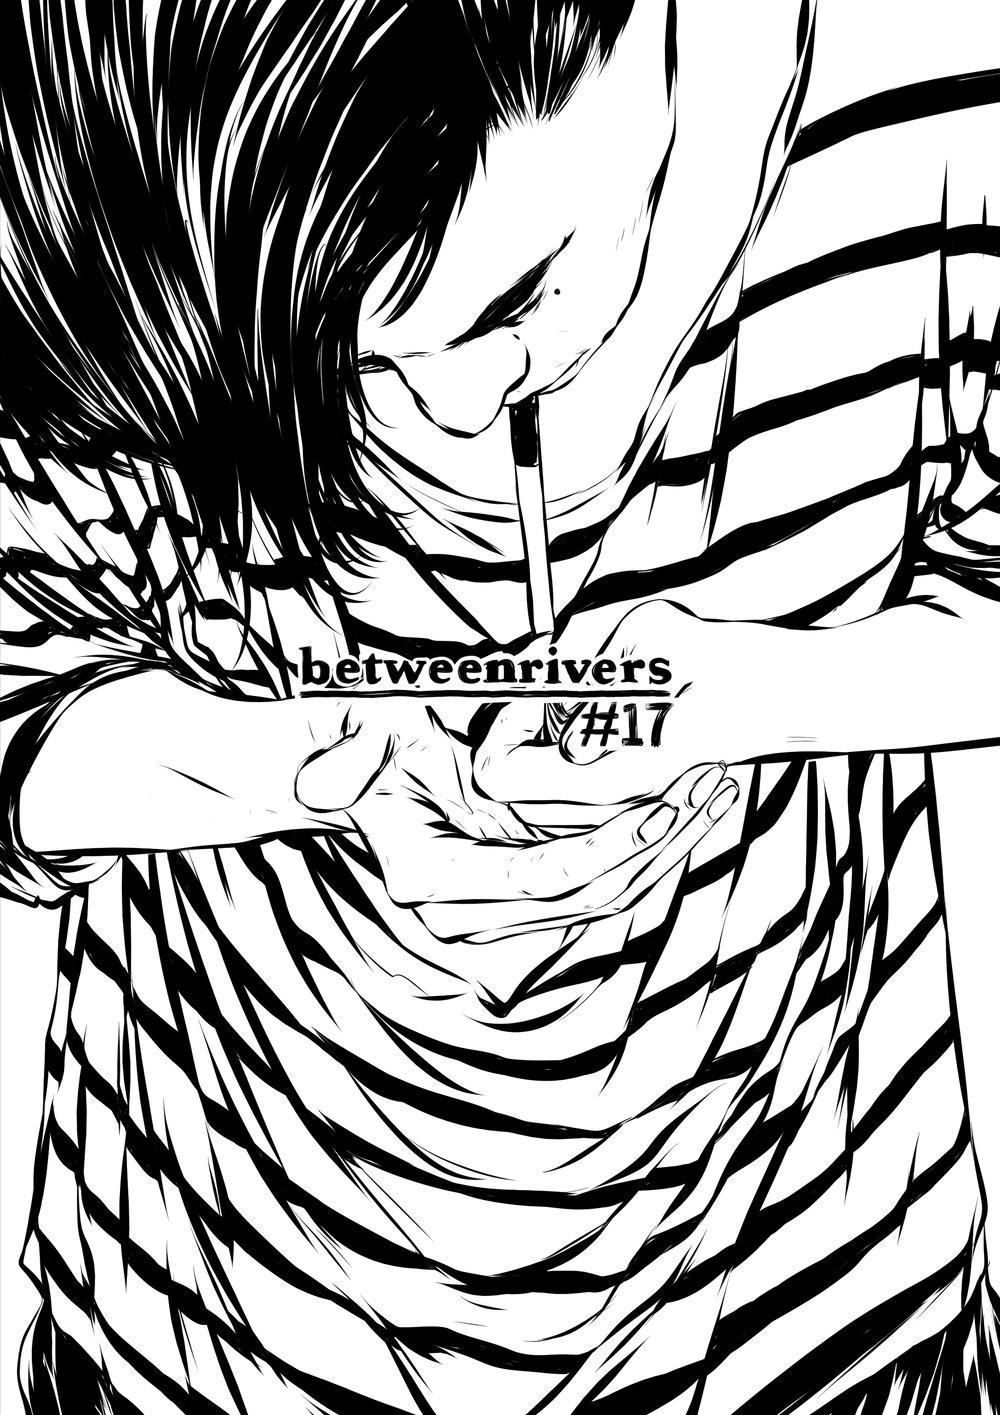 MojoWang_BetweenRivers_17_00.jpg